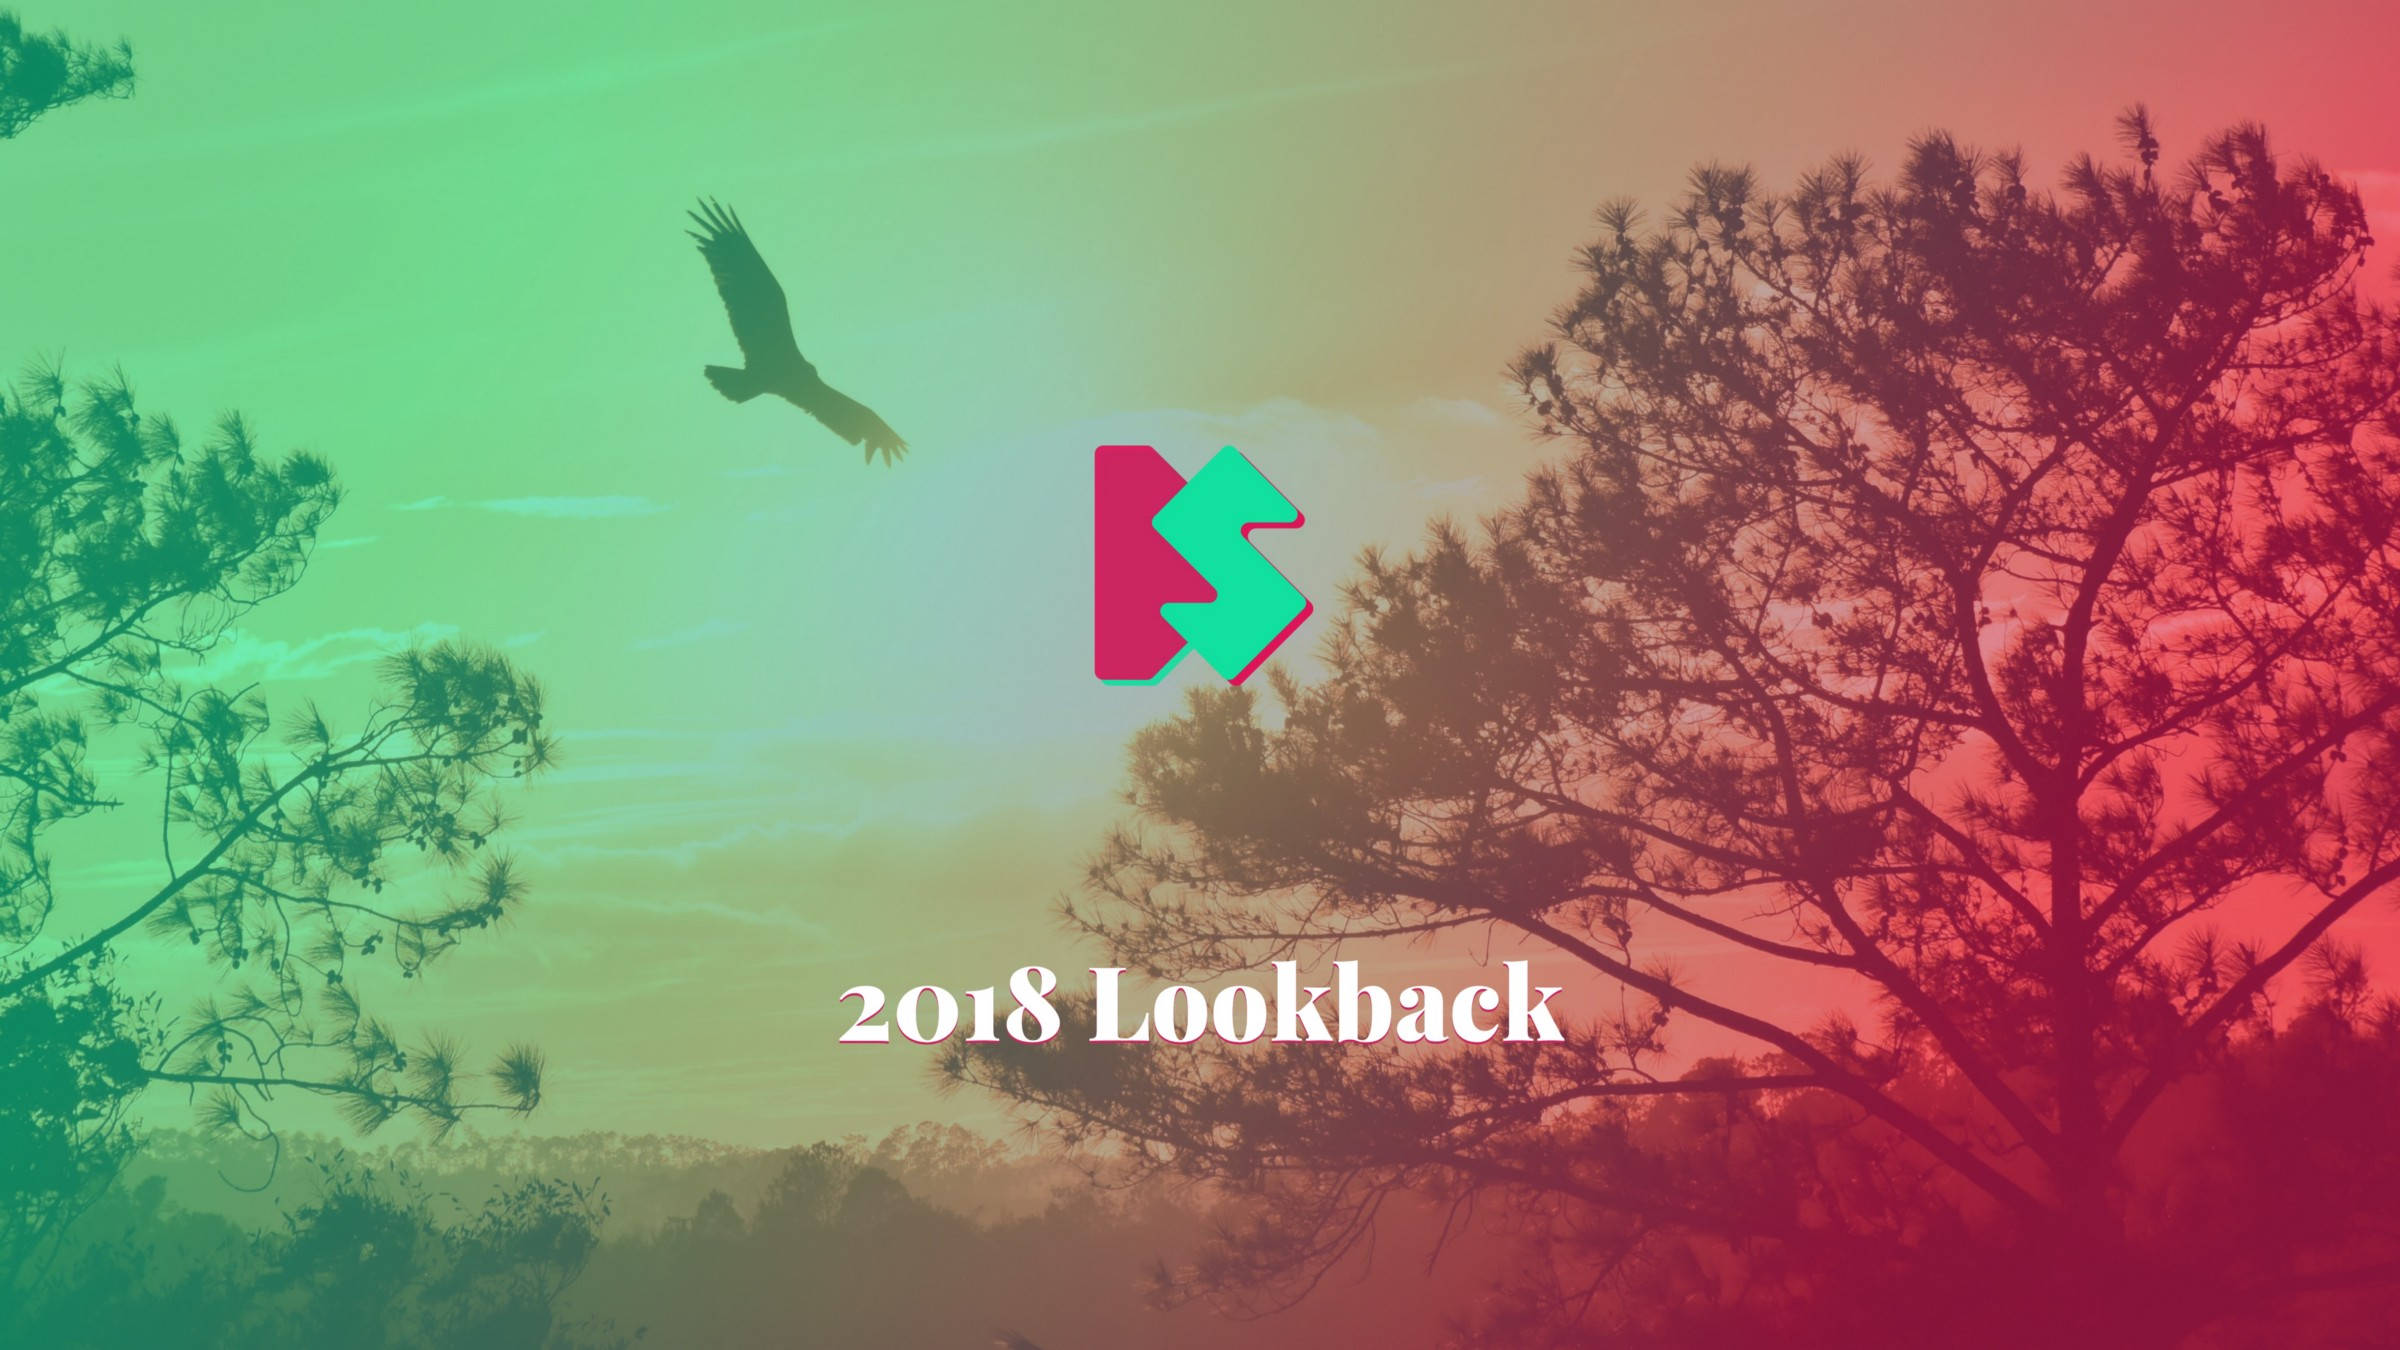 /2018-lookback-63cba515c309 feature image